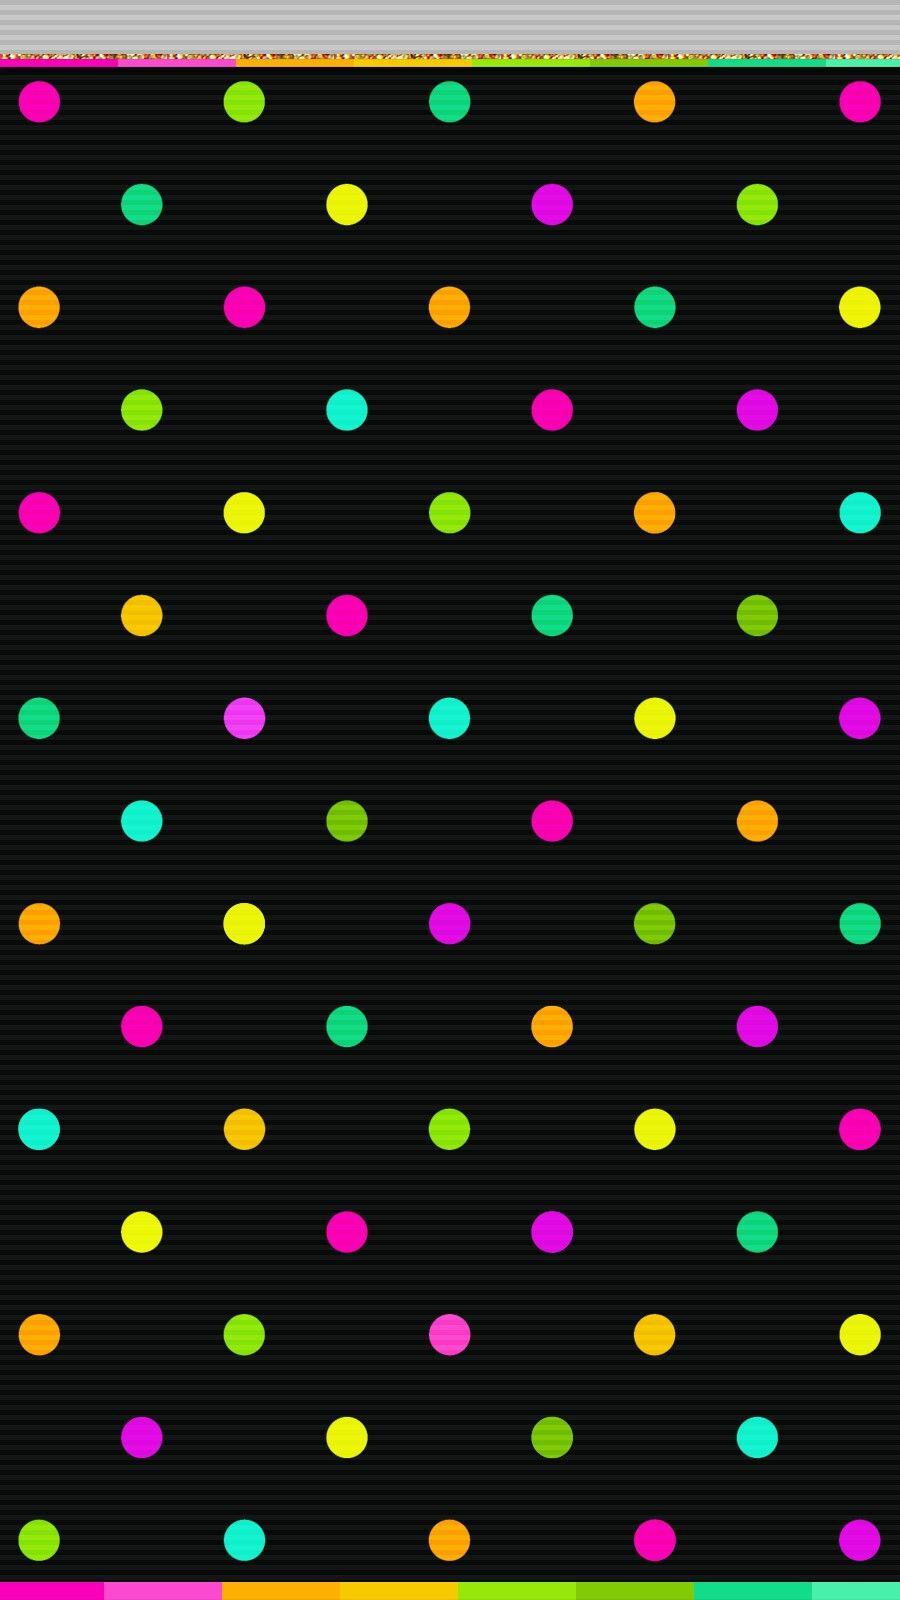 Happy Holi S8 Wallpaper Black Wallpaper Lock Screen